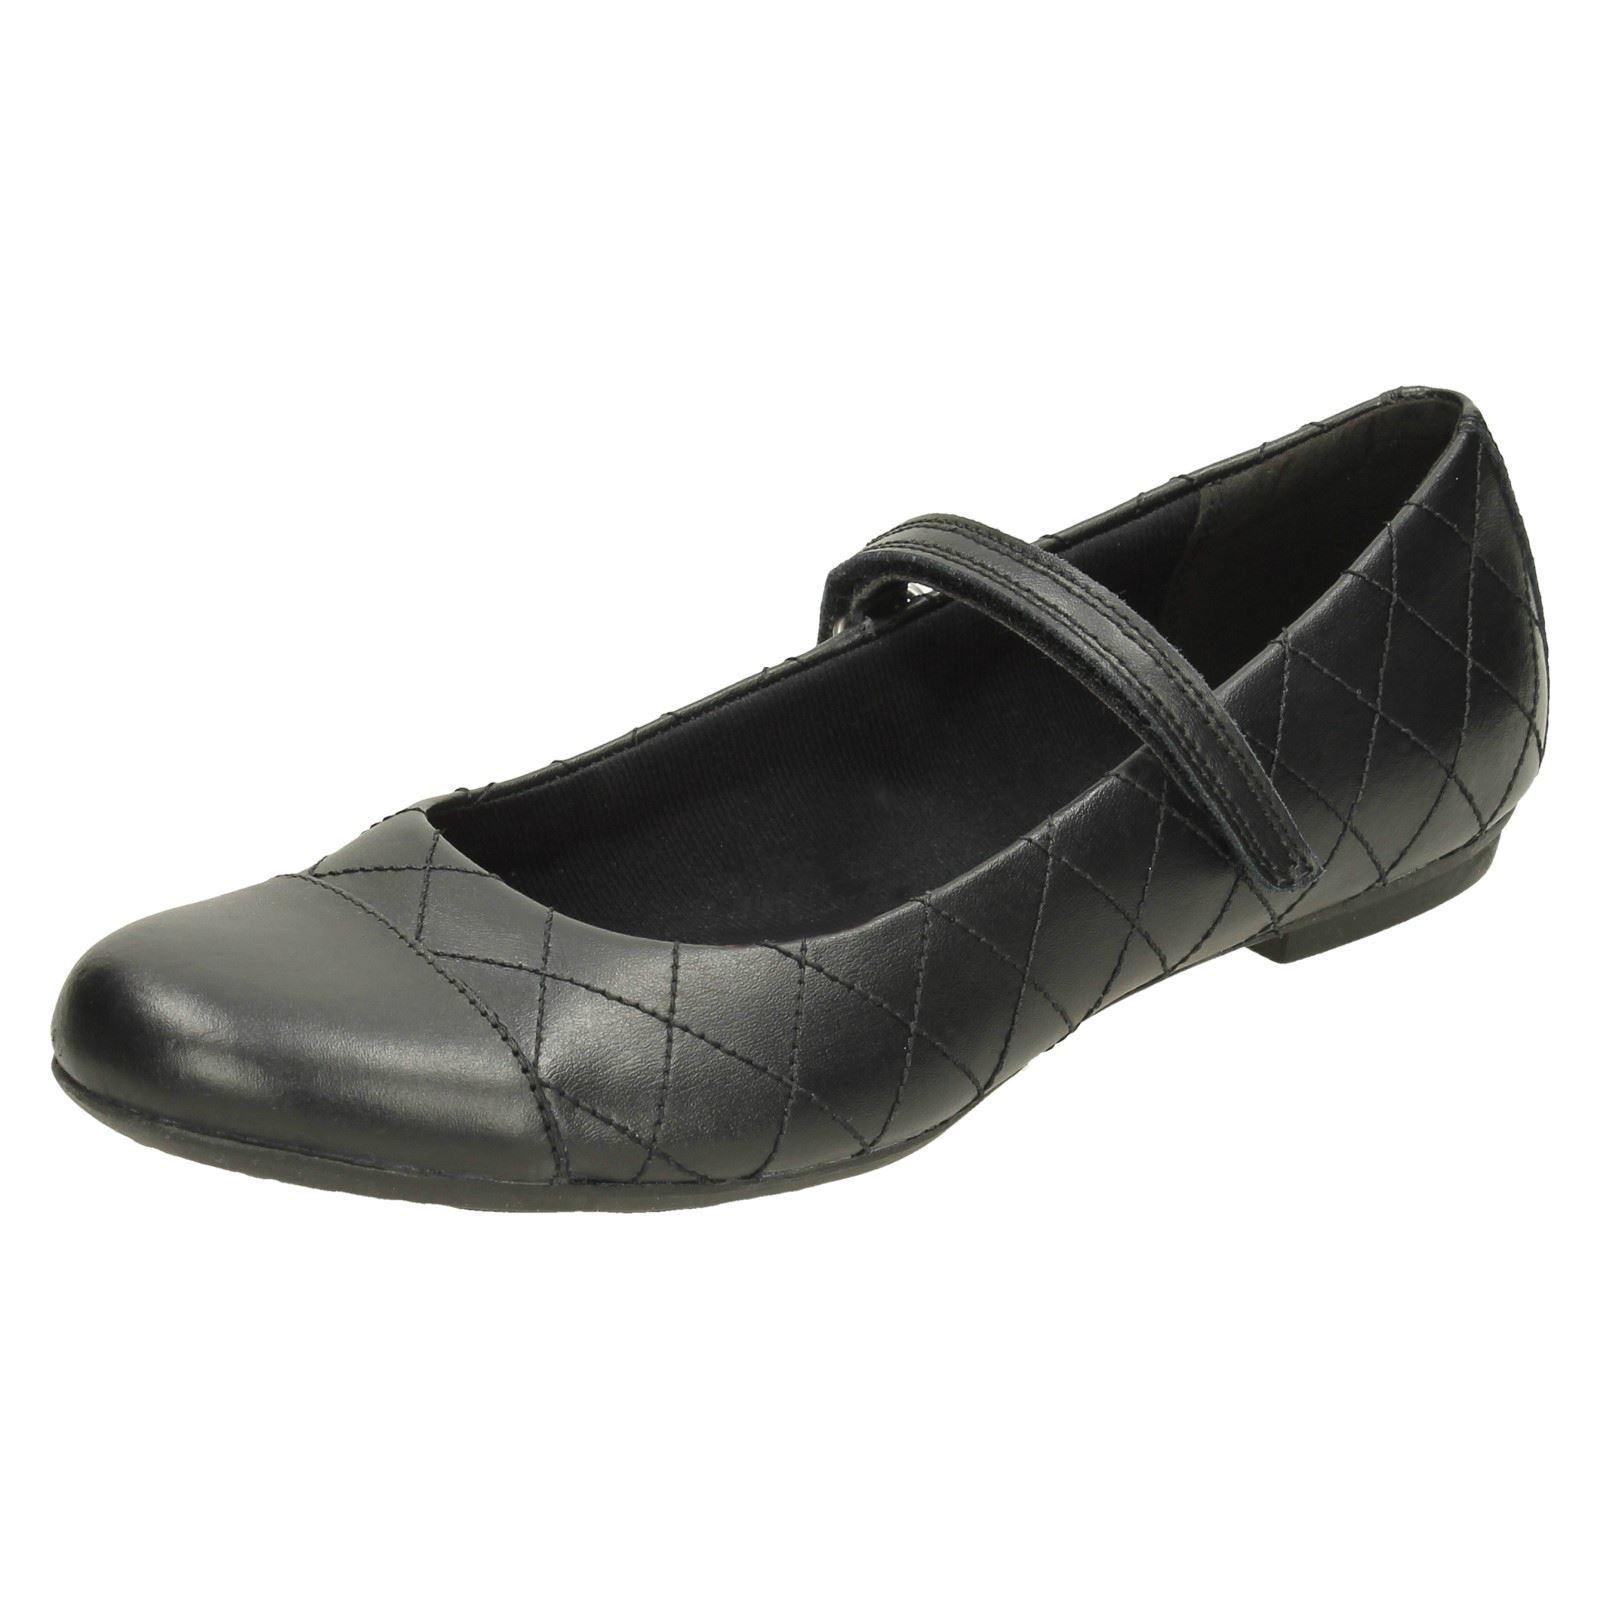 Clarks School Shoes 'Kimberly Gem